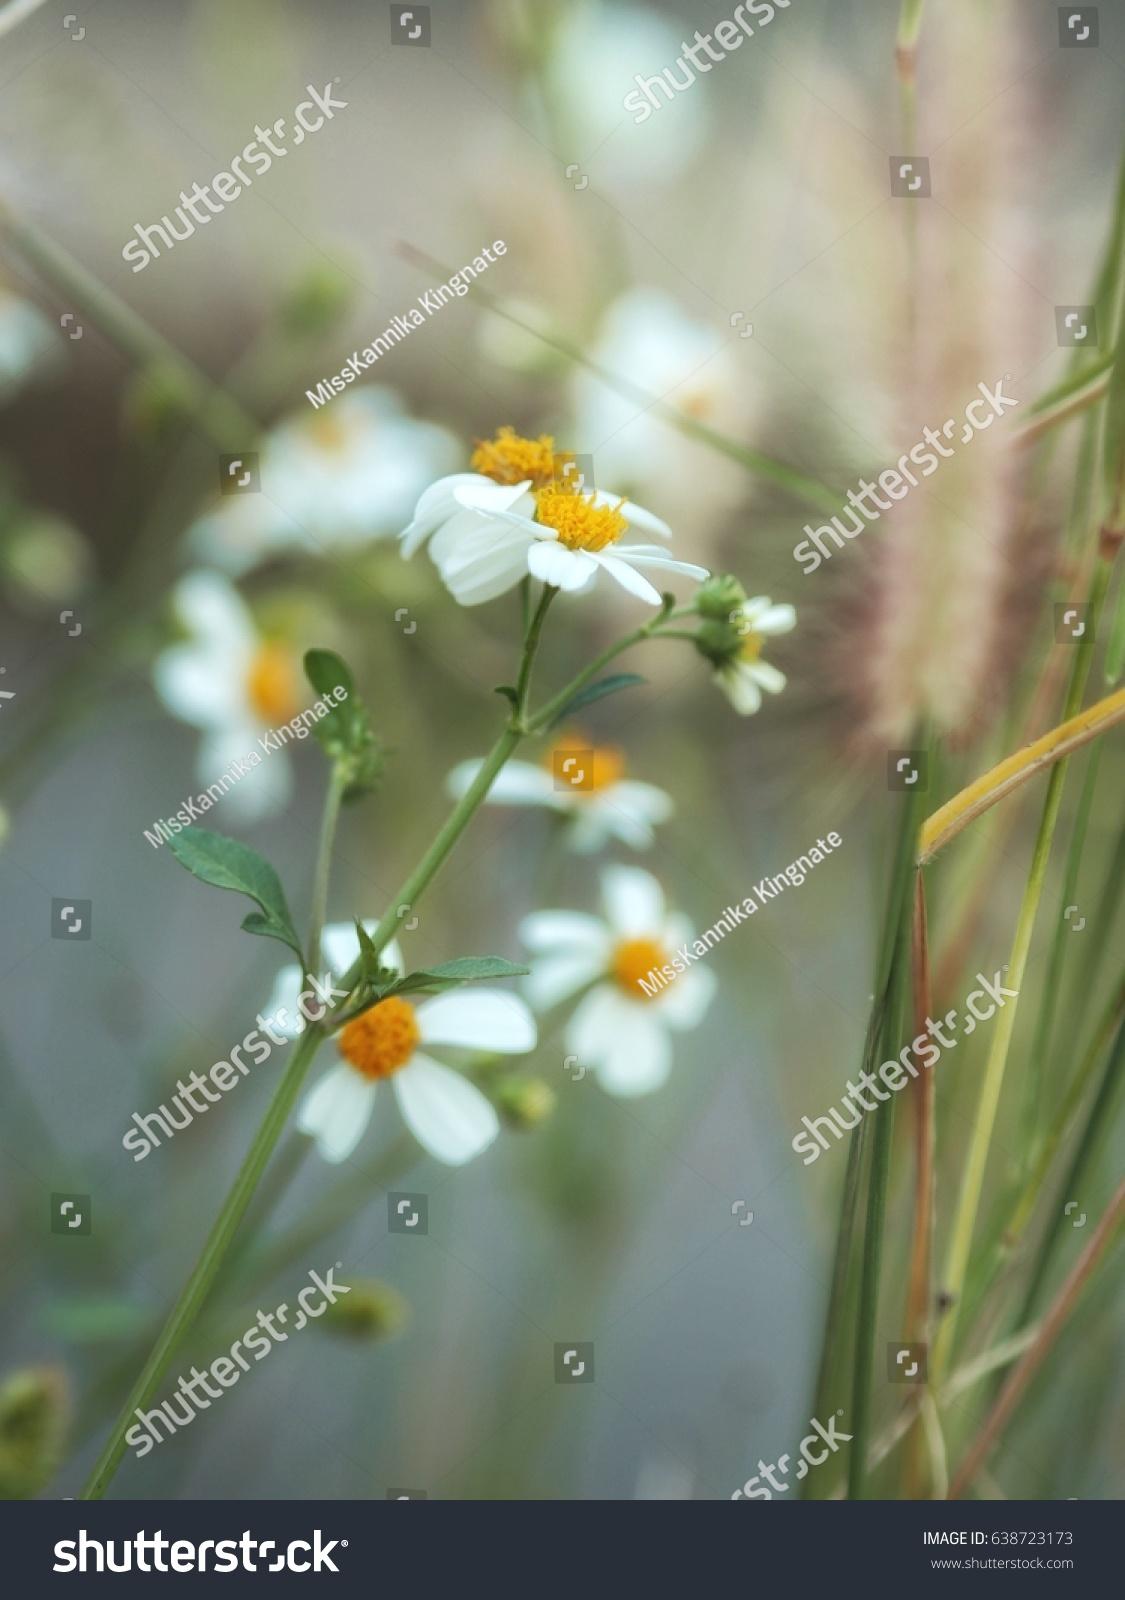 Beautiful White Flower In The Dream In The Green Garden Ez Canvas